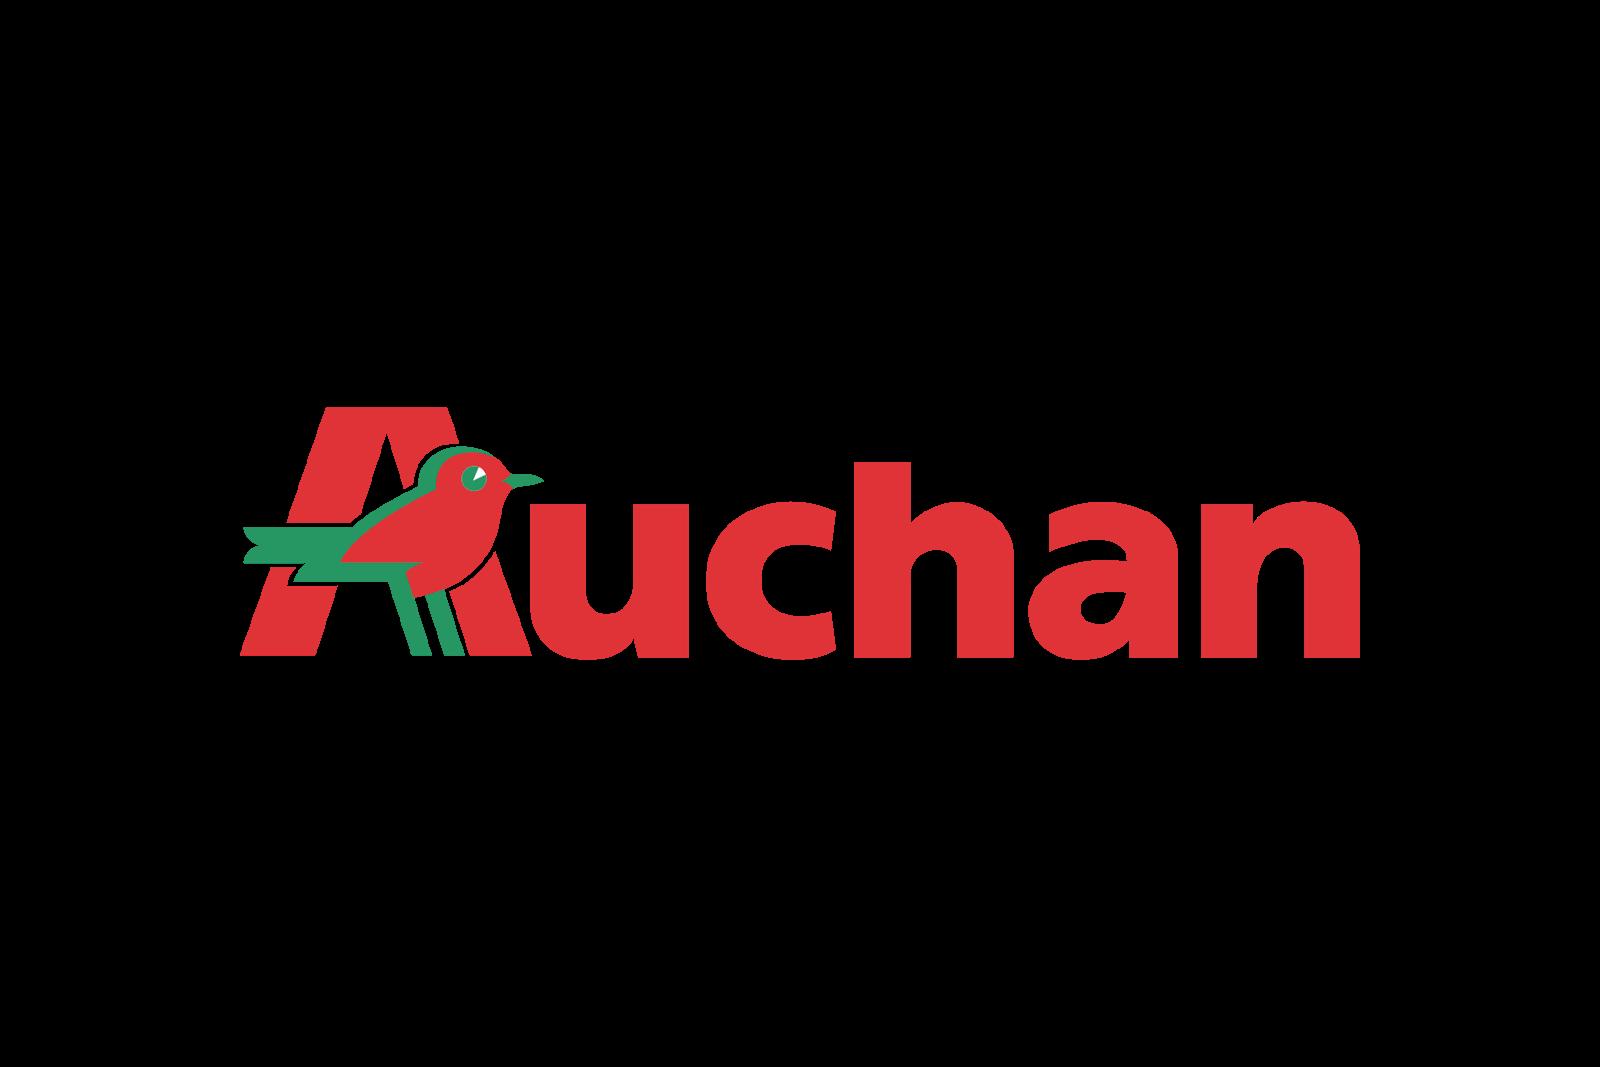 Logo Auchan.png (1600×1067) - Auchan PNG